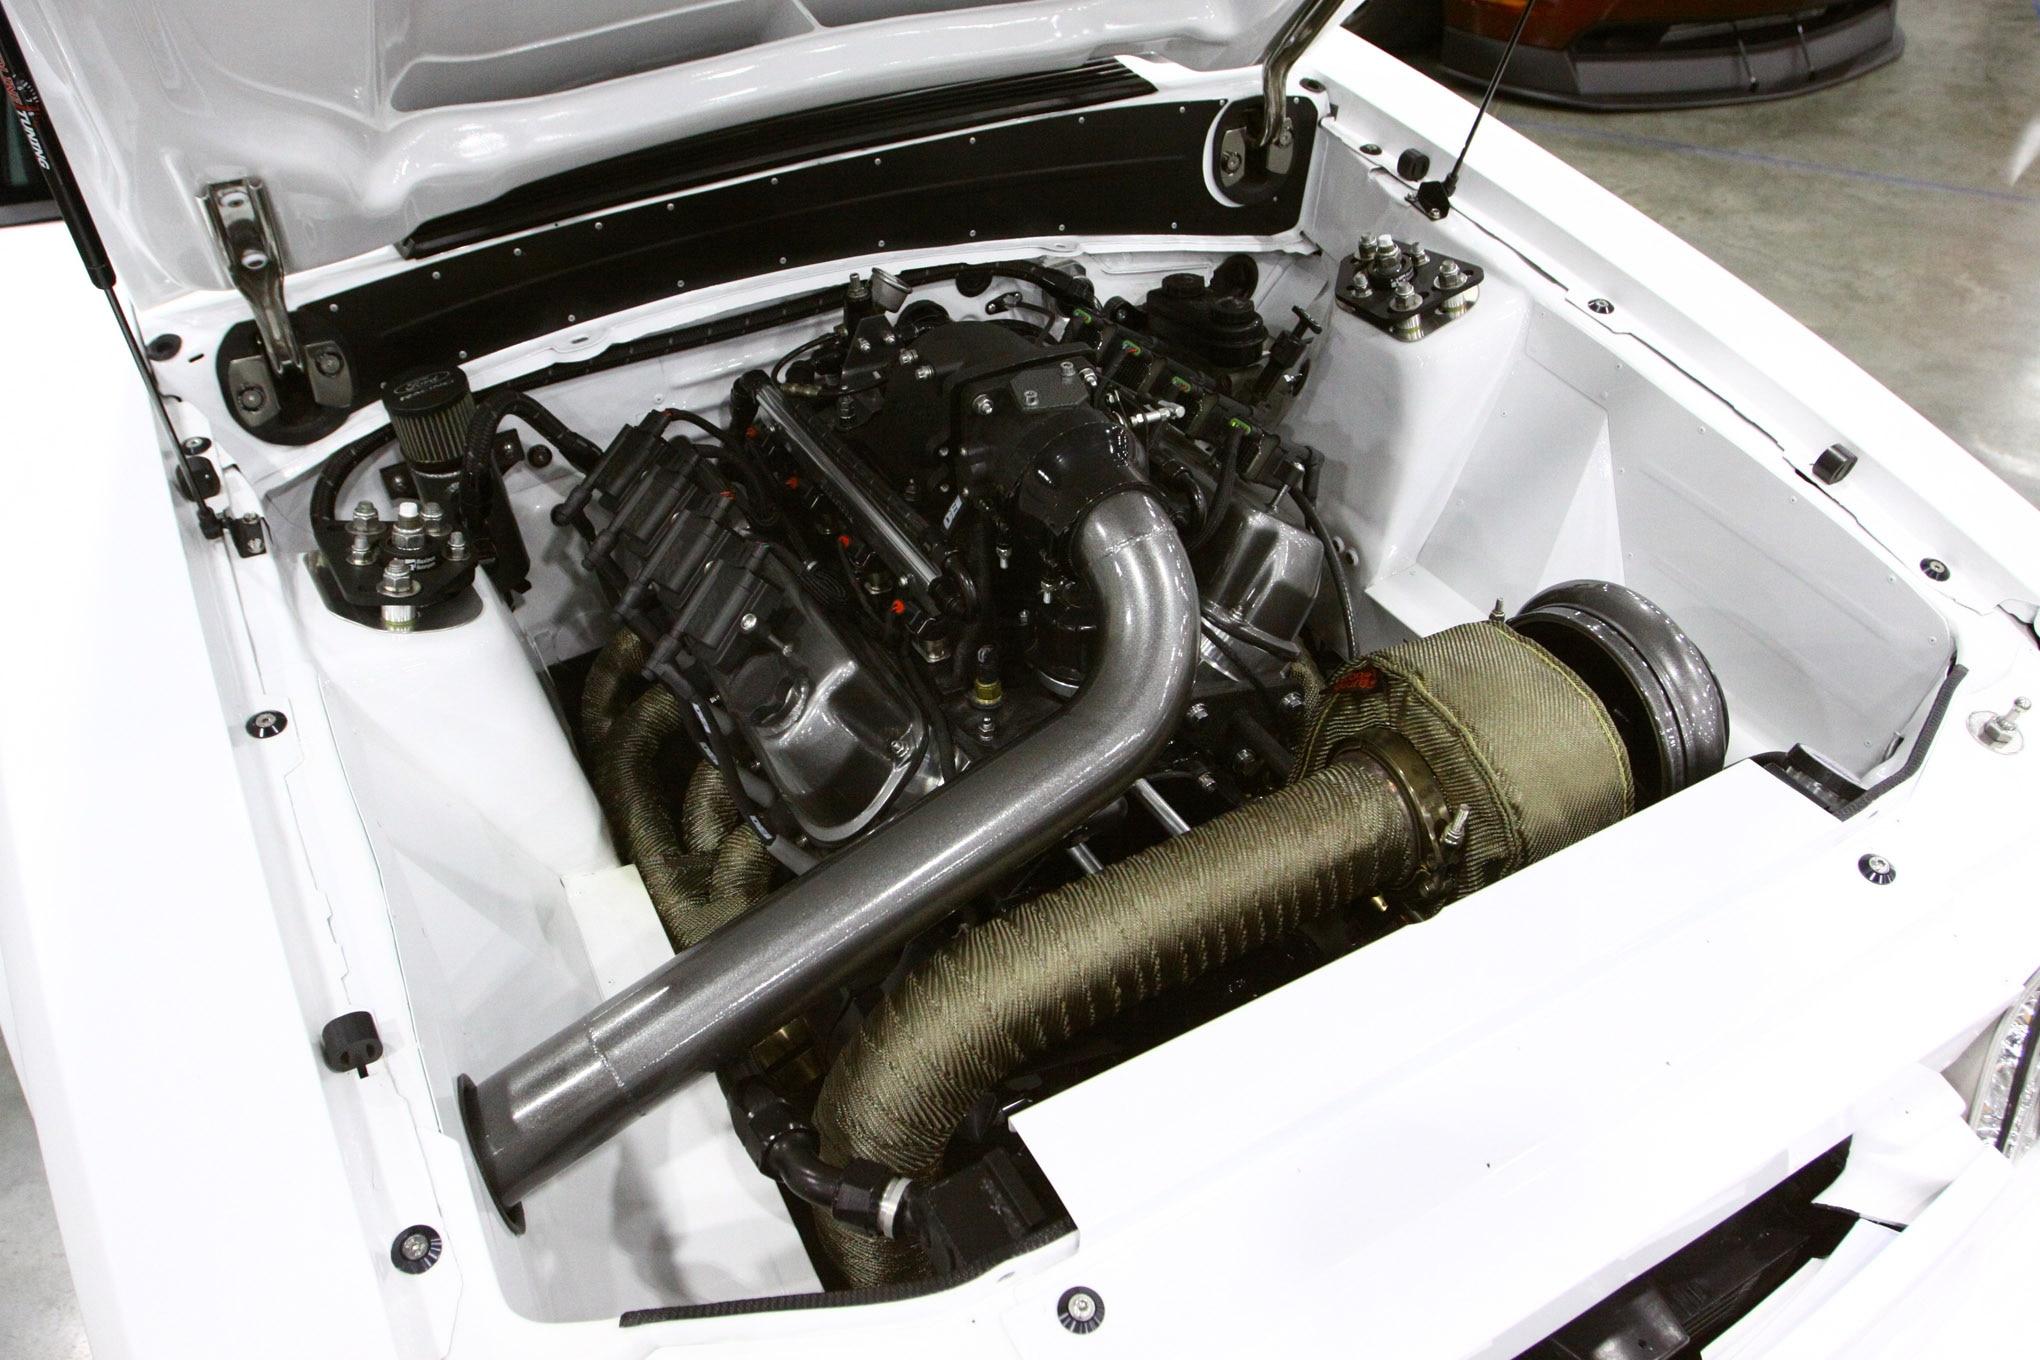 Friday CJ Pony Parts Mustang Week Car Show 144